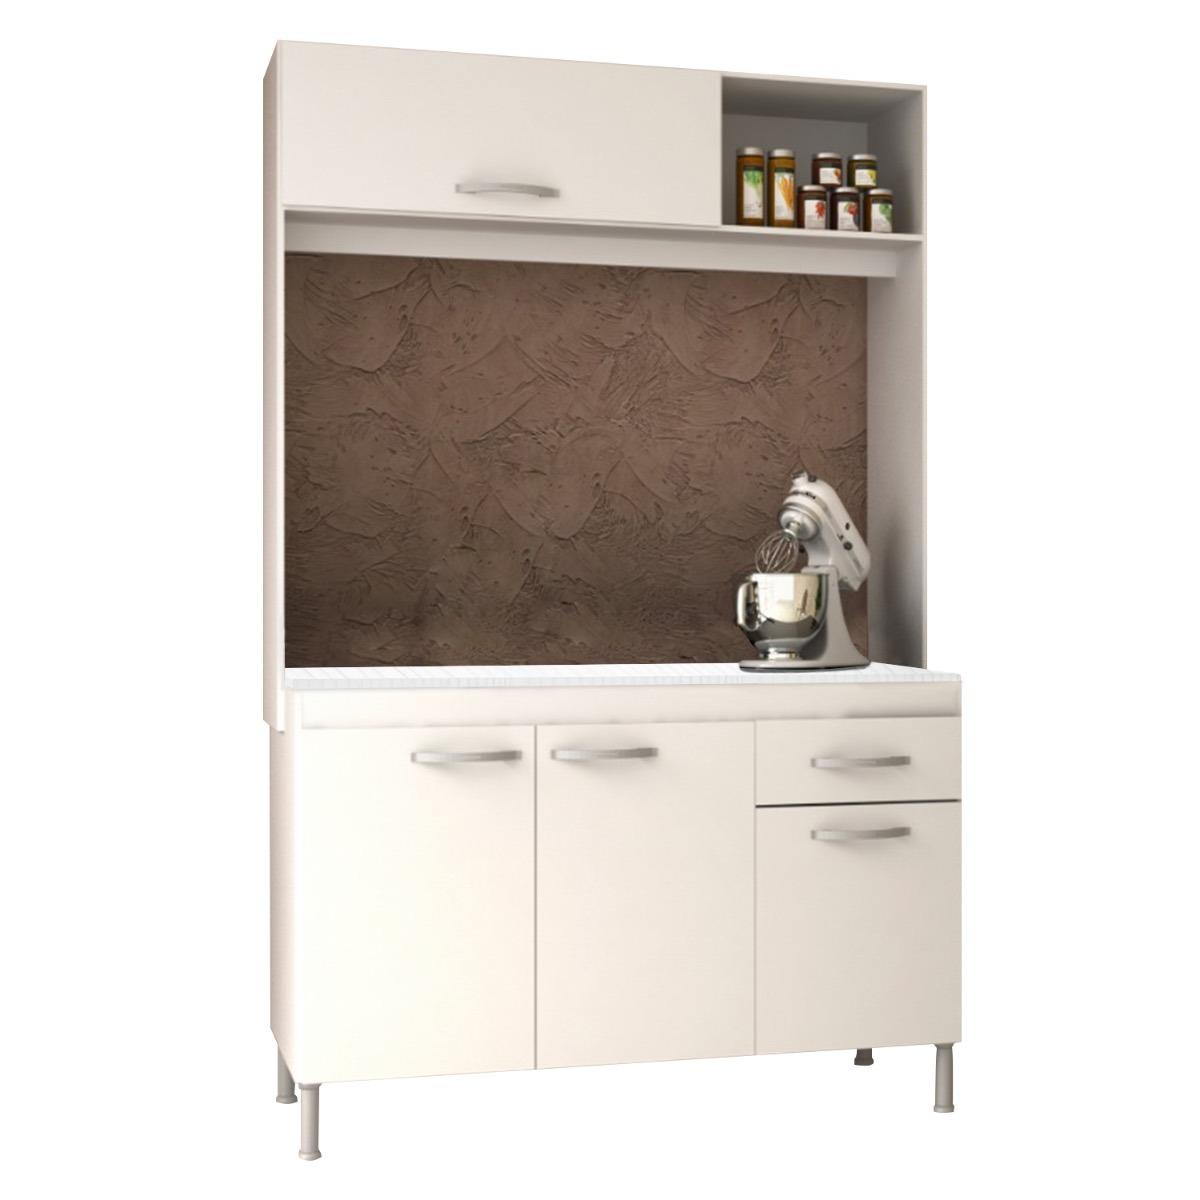 Mueble Alacena Kit De Cocina Compacta Multimuebles - $ 3.100,00 en ...